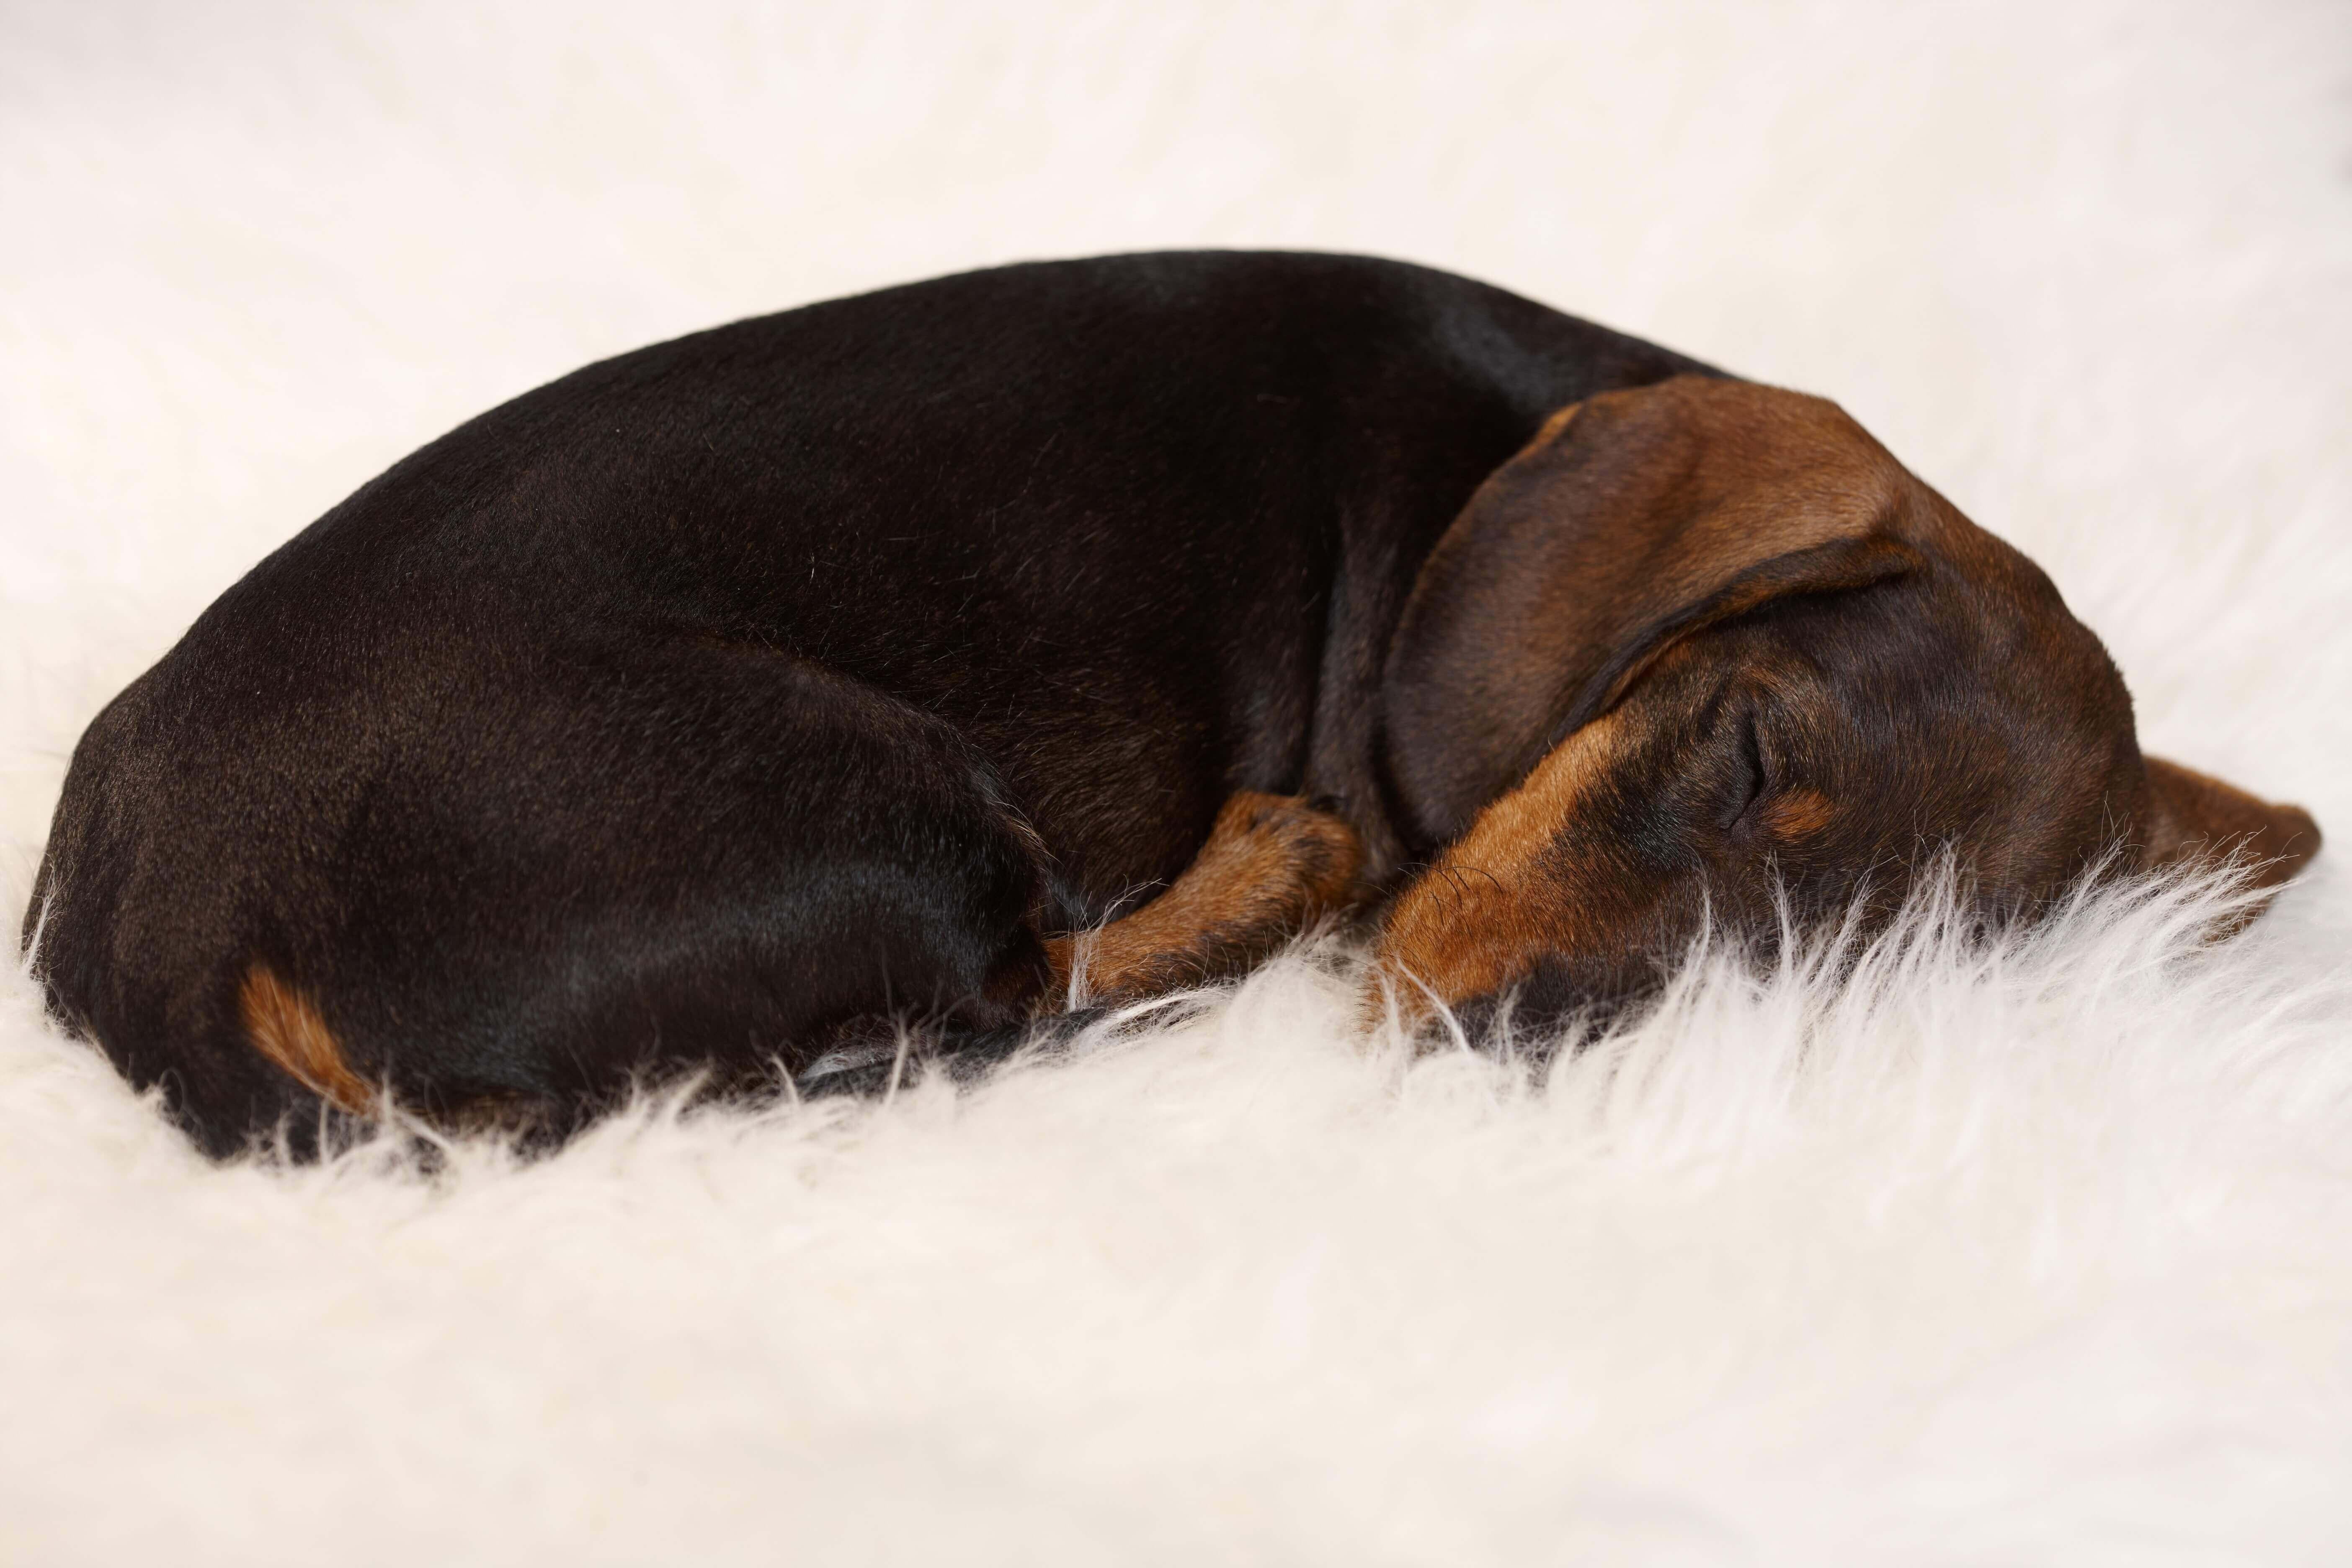 Sausage dog snuggles on rug, used in blog 4 reasons taking breaks make your brain work